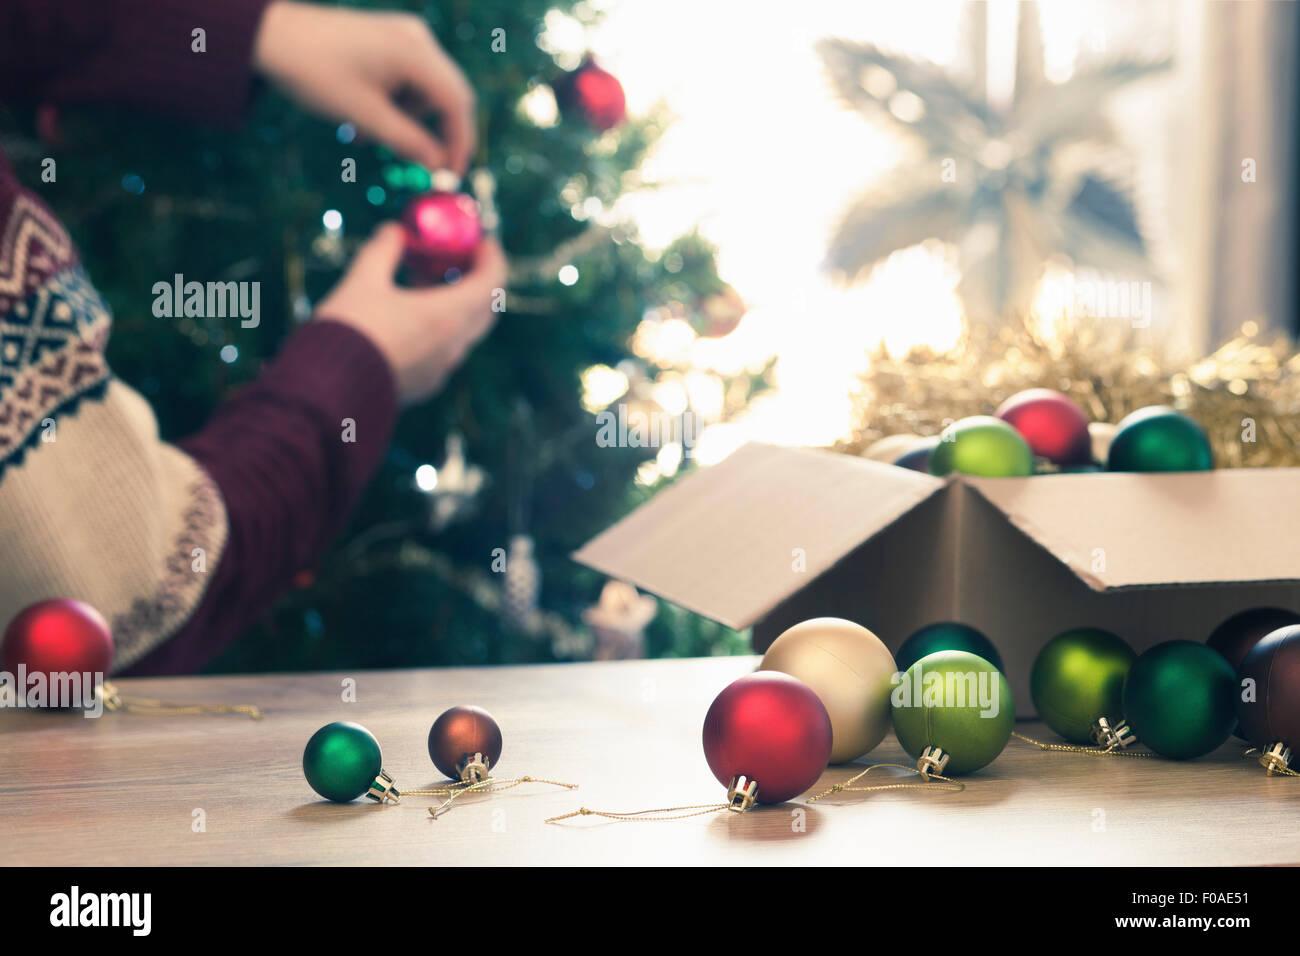 Person decorating christmas tree - Stock Image